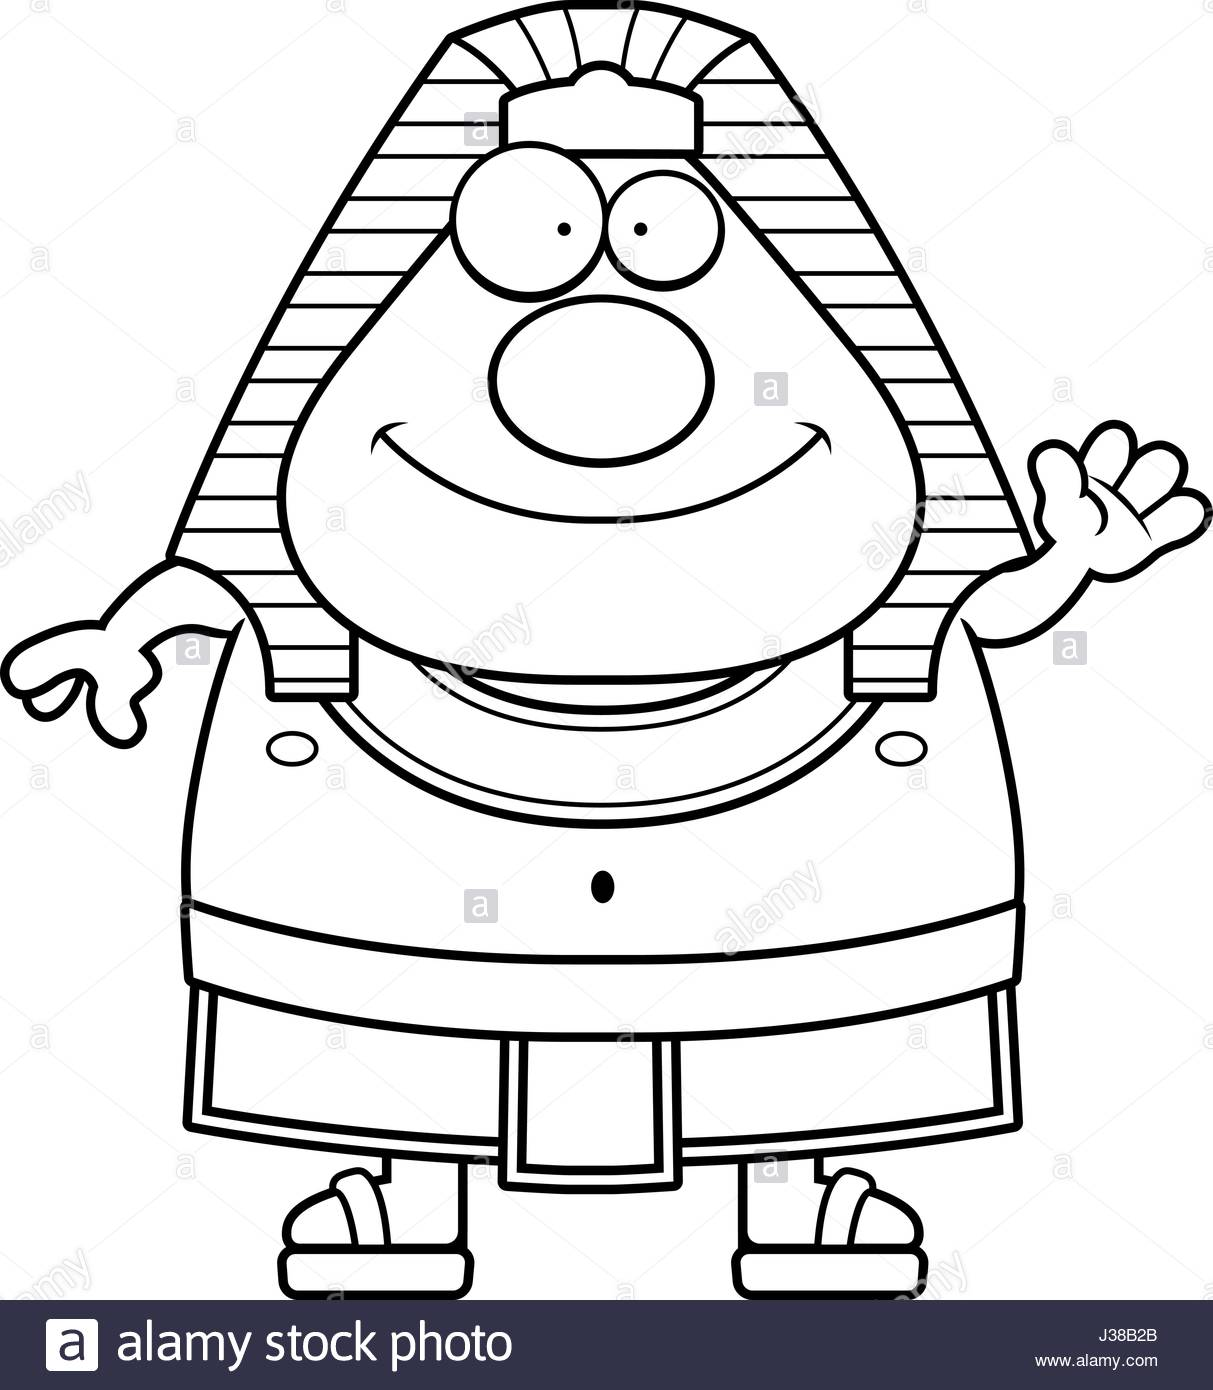 1213x1390 A Cartoon Illustration Of An Egyptian Pharaoh Waving Stock Vector